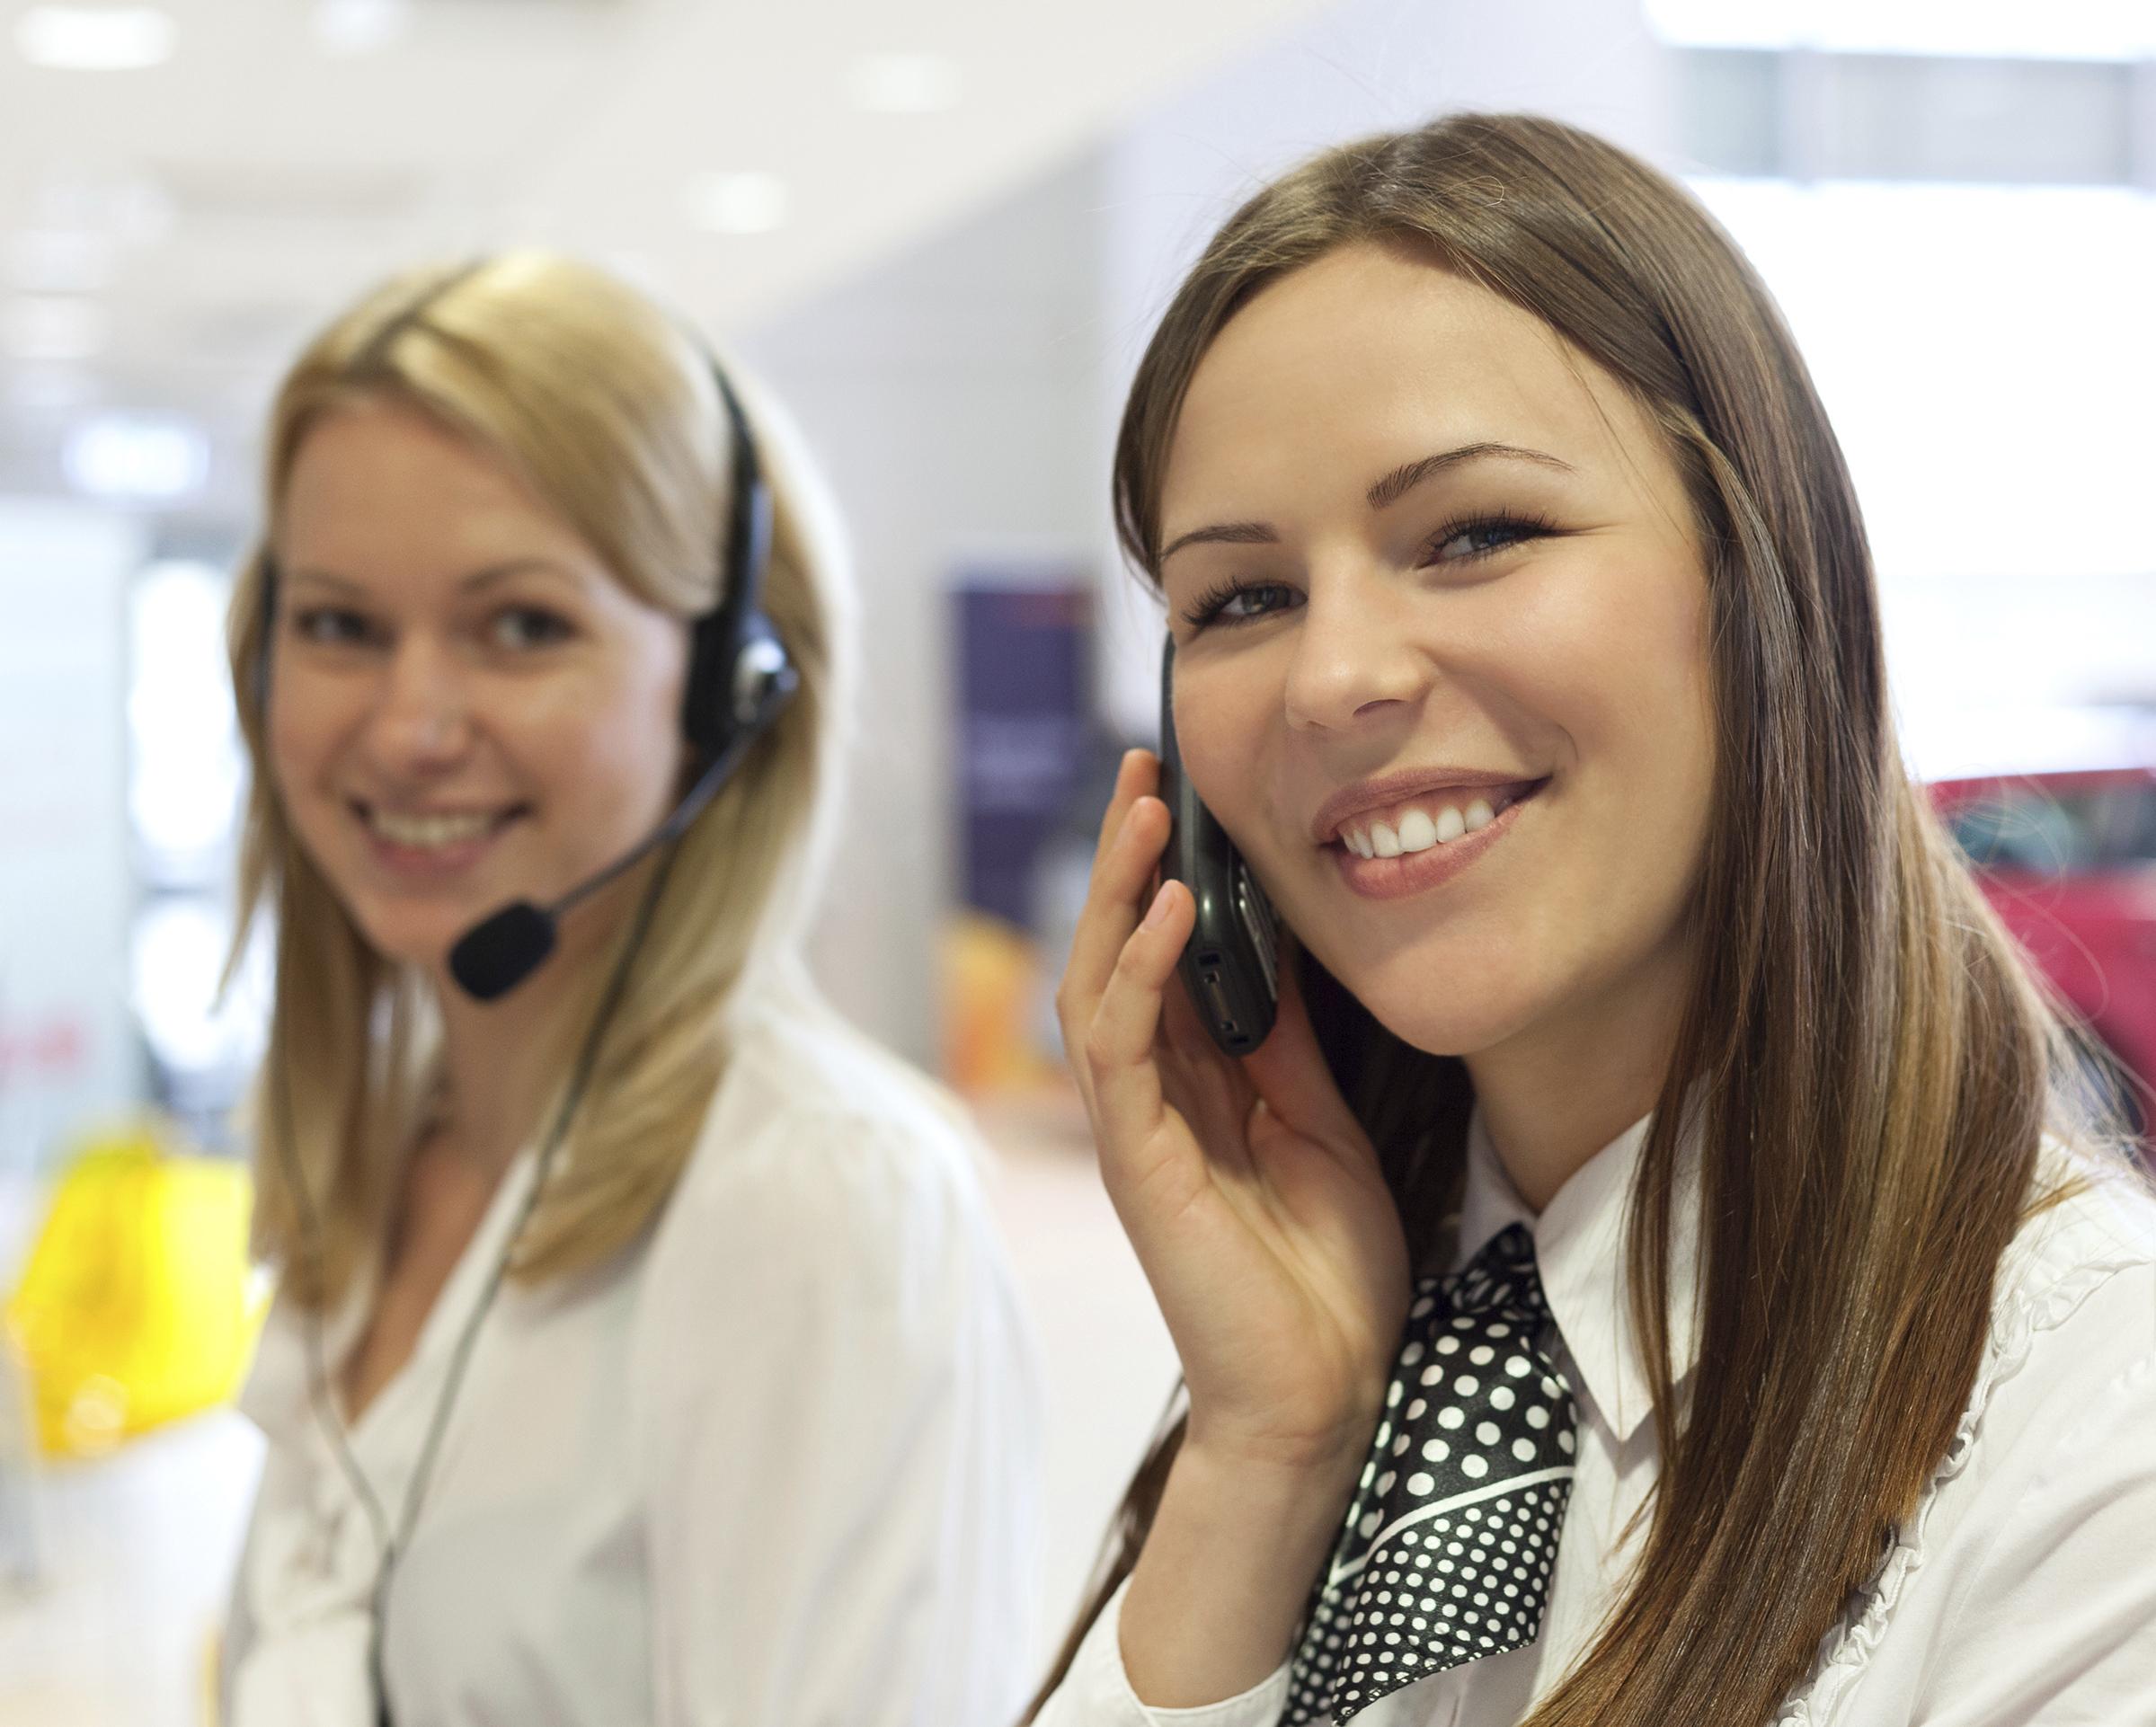 Shoplatissemd customer service